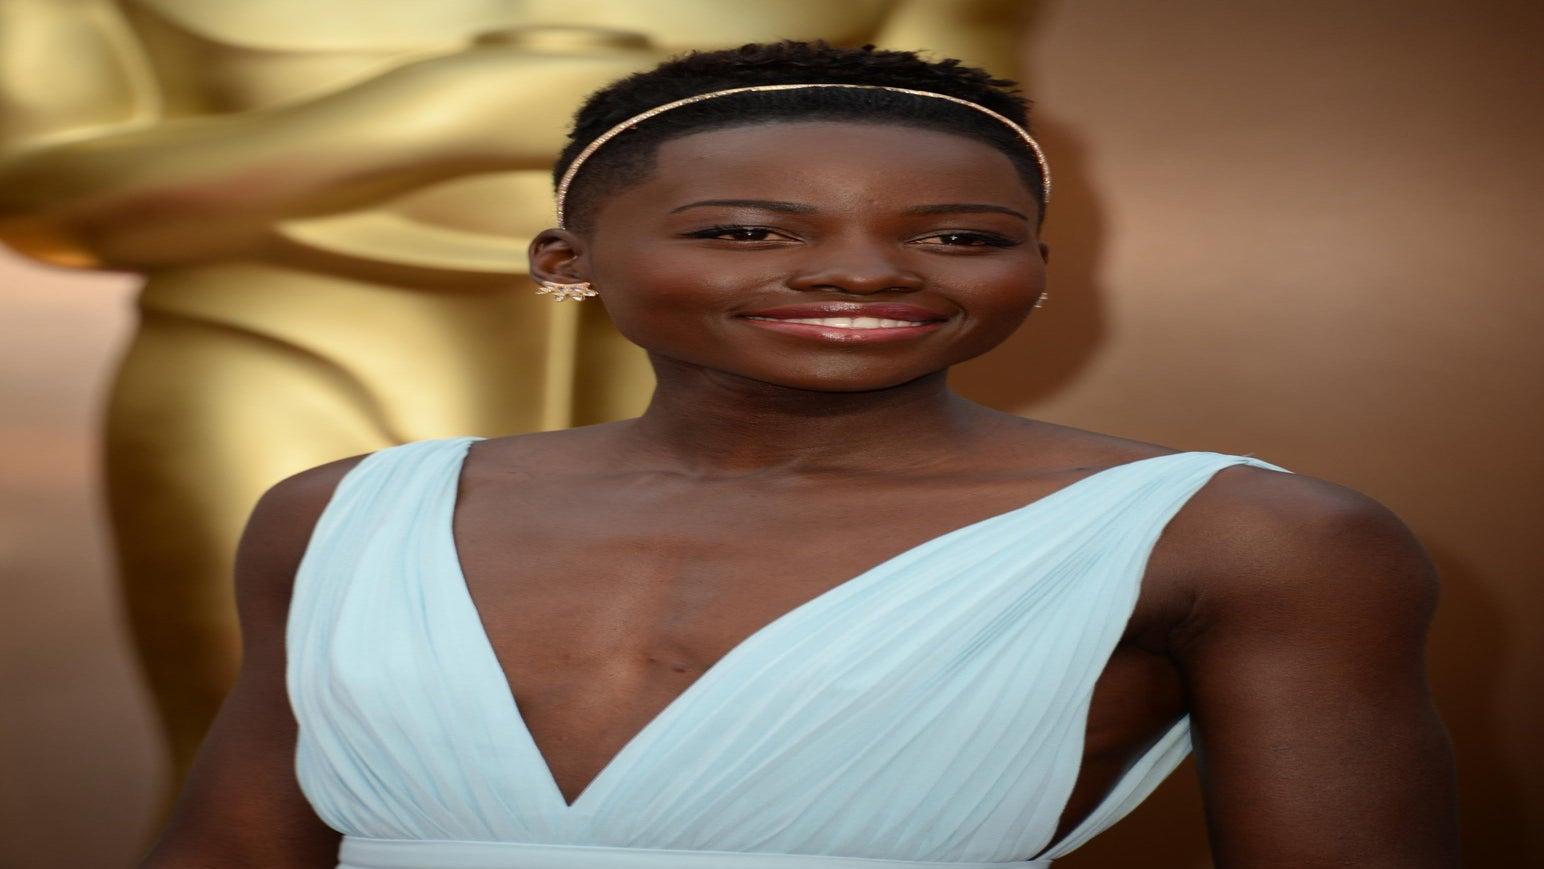 Lupita Nyong'o, David Oyelowo In Talks To Star In New Disney Movie 'Queen of Katwe'